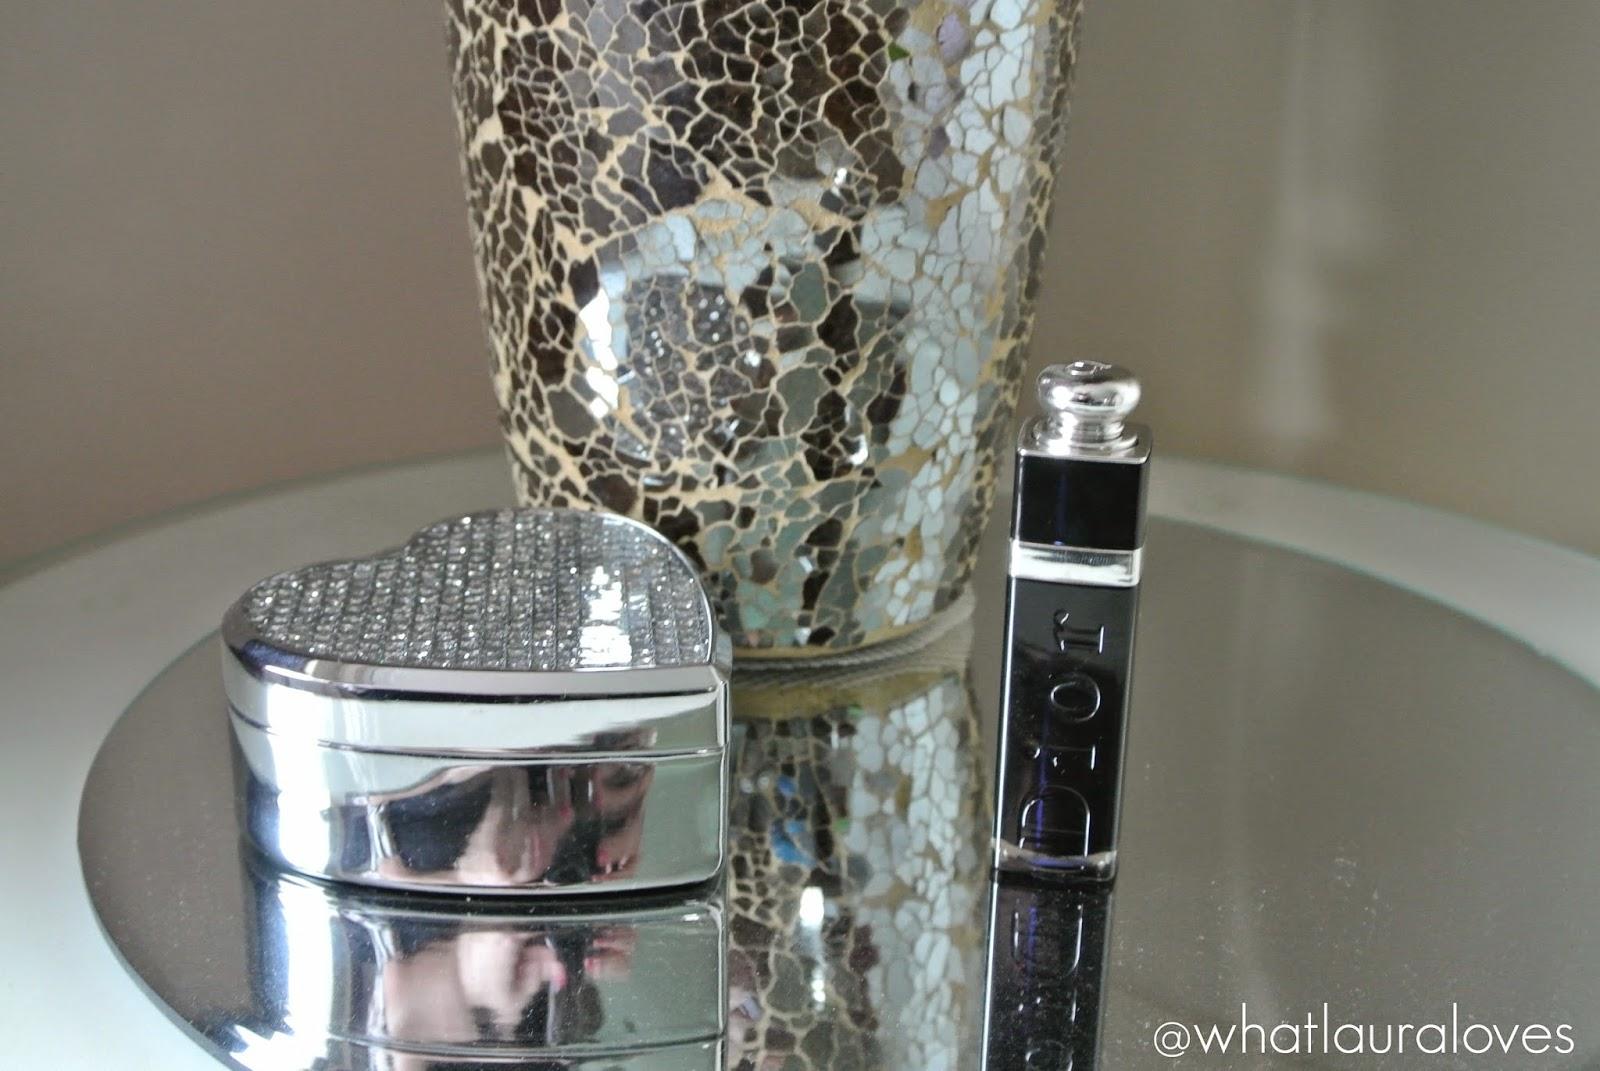 Dior Addict Extreme Lipstick in 886 Paparazzi Review